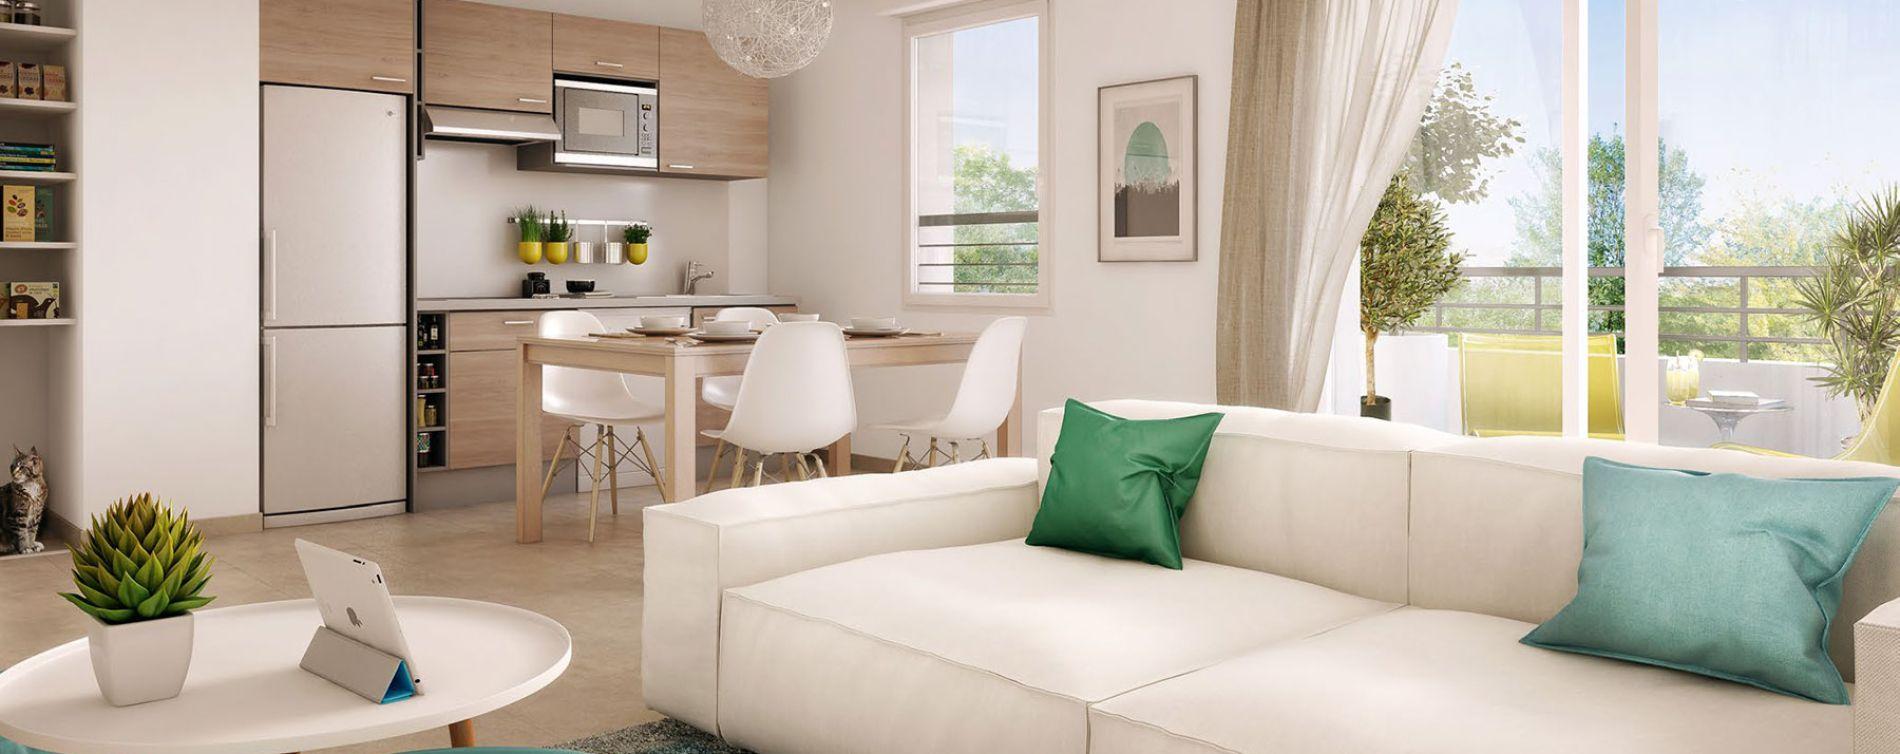 Nantes : programme immobilier neuve « Programme immobilier n°217825 » (3)